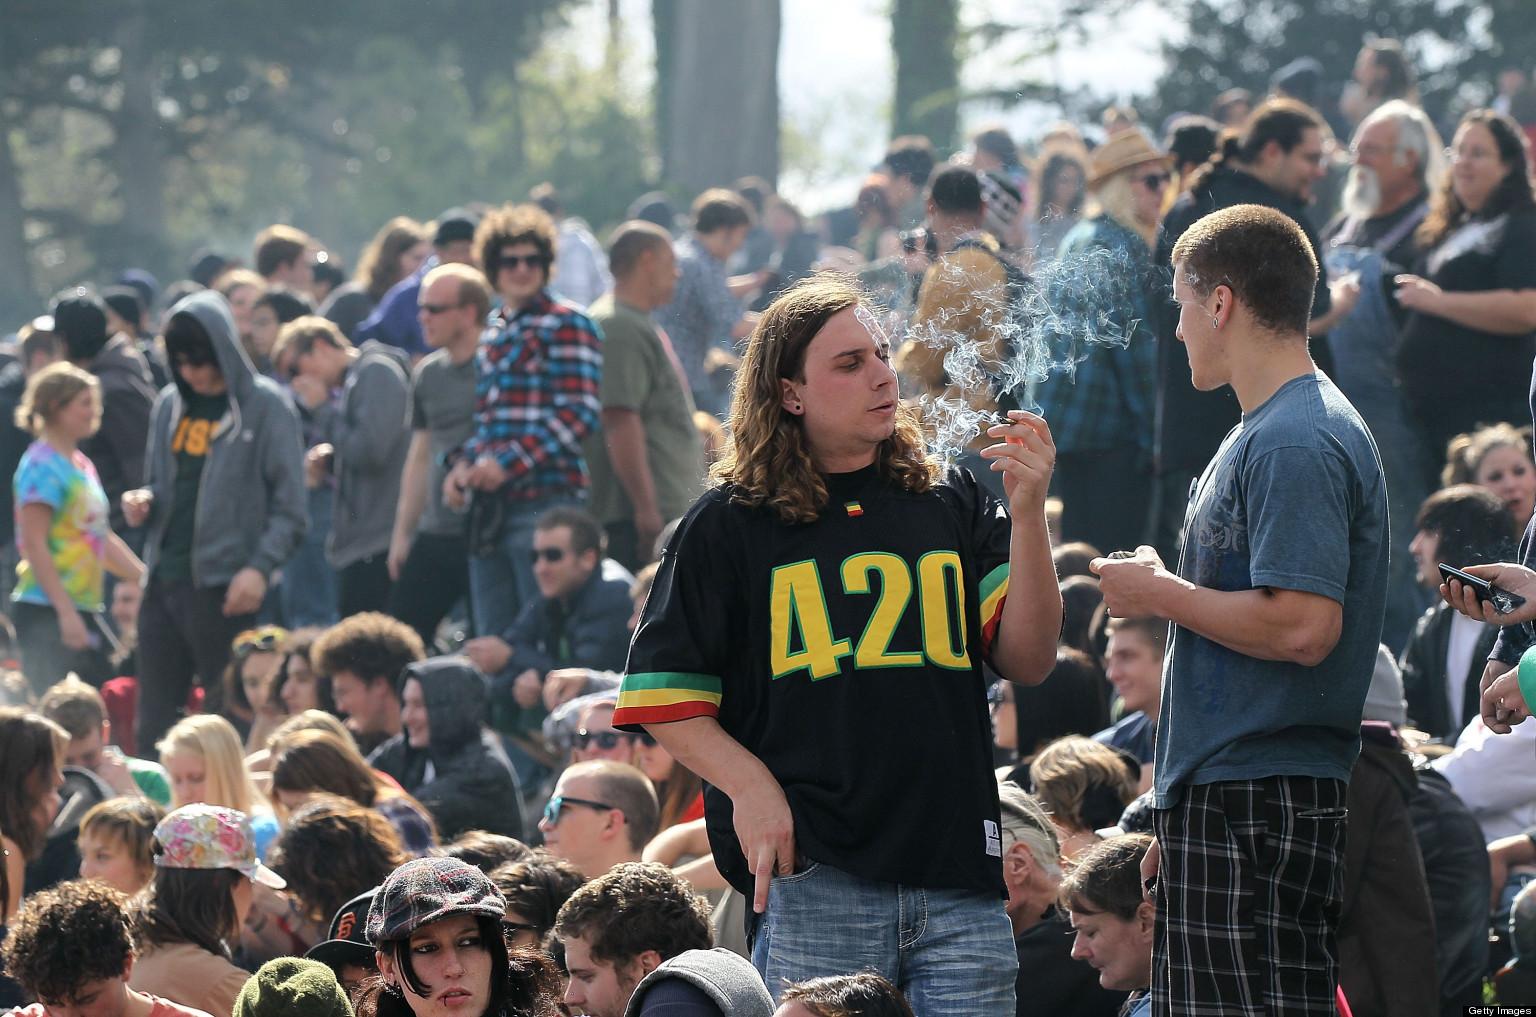 420 Marijuana Term Waldo Originators Debunk New 420 Claim ...